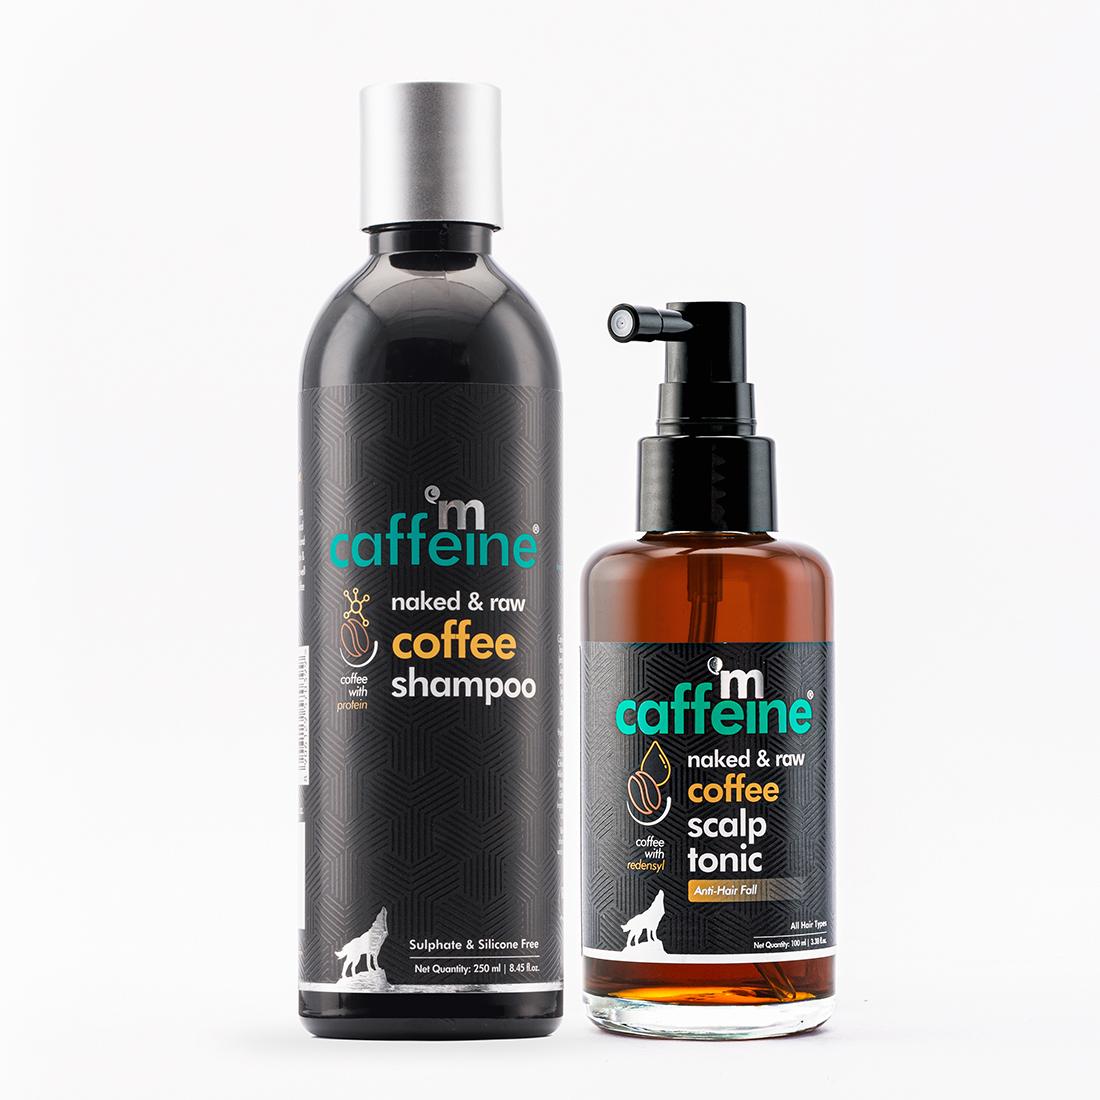 MCaffeine | mCaffeine Coffee Hair Boost & Hair Fall Control Kit | Shampoo, Scalp Tonic